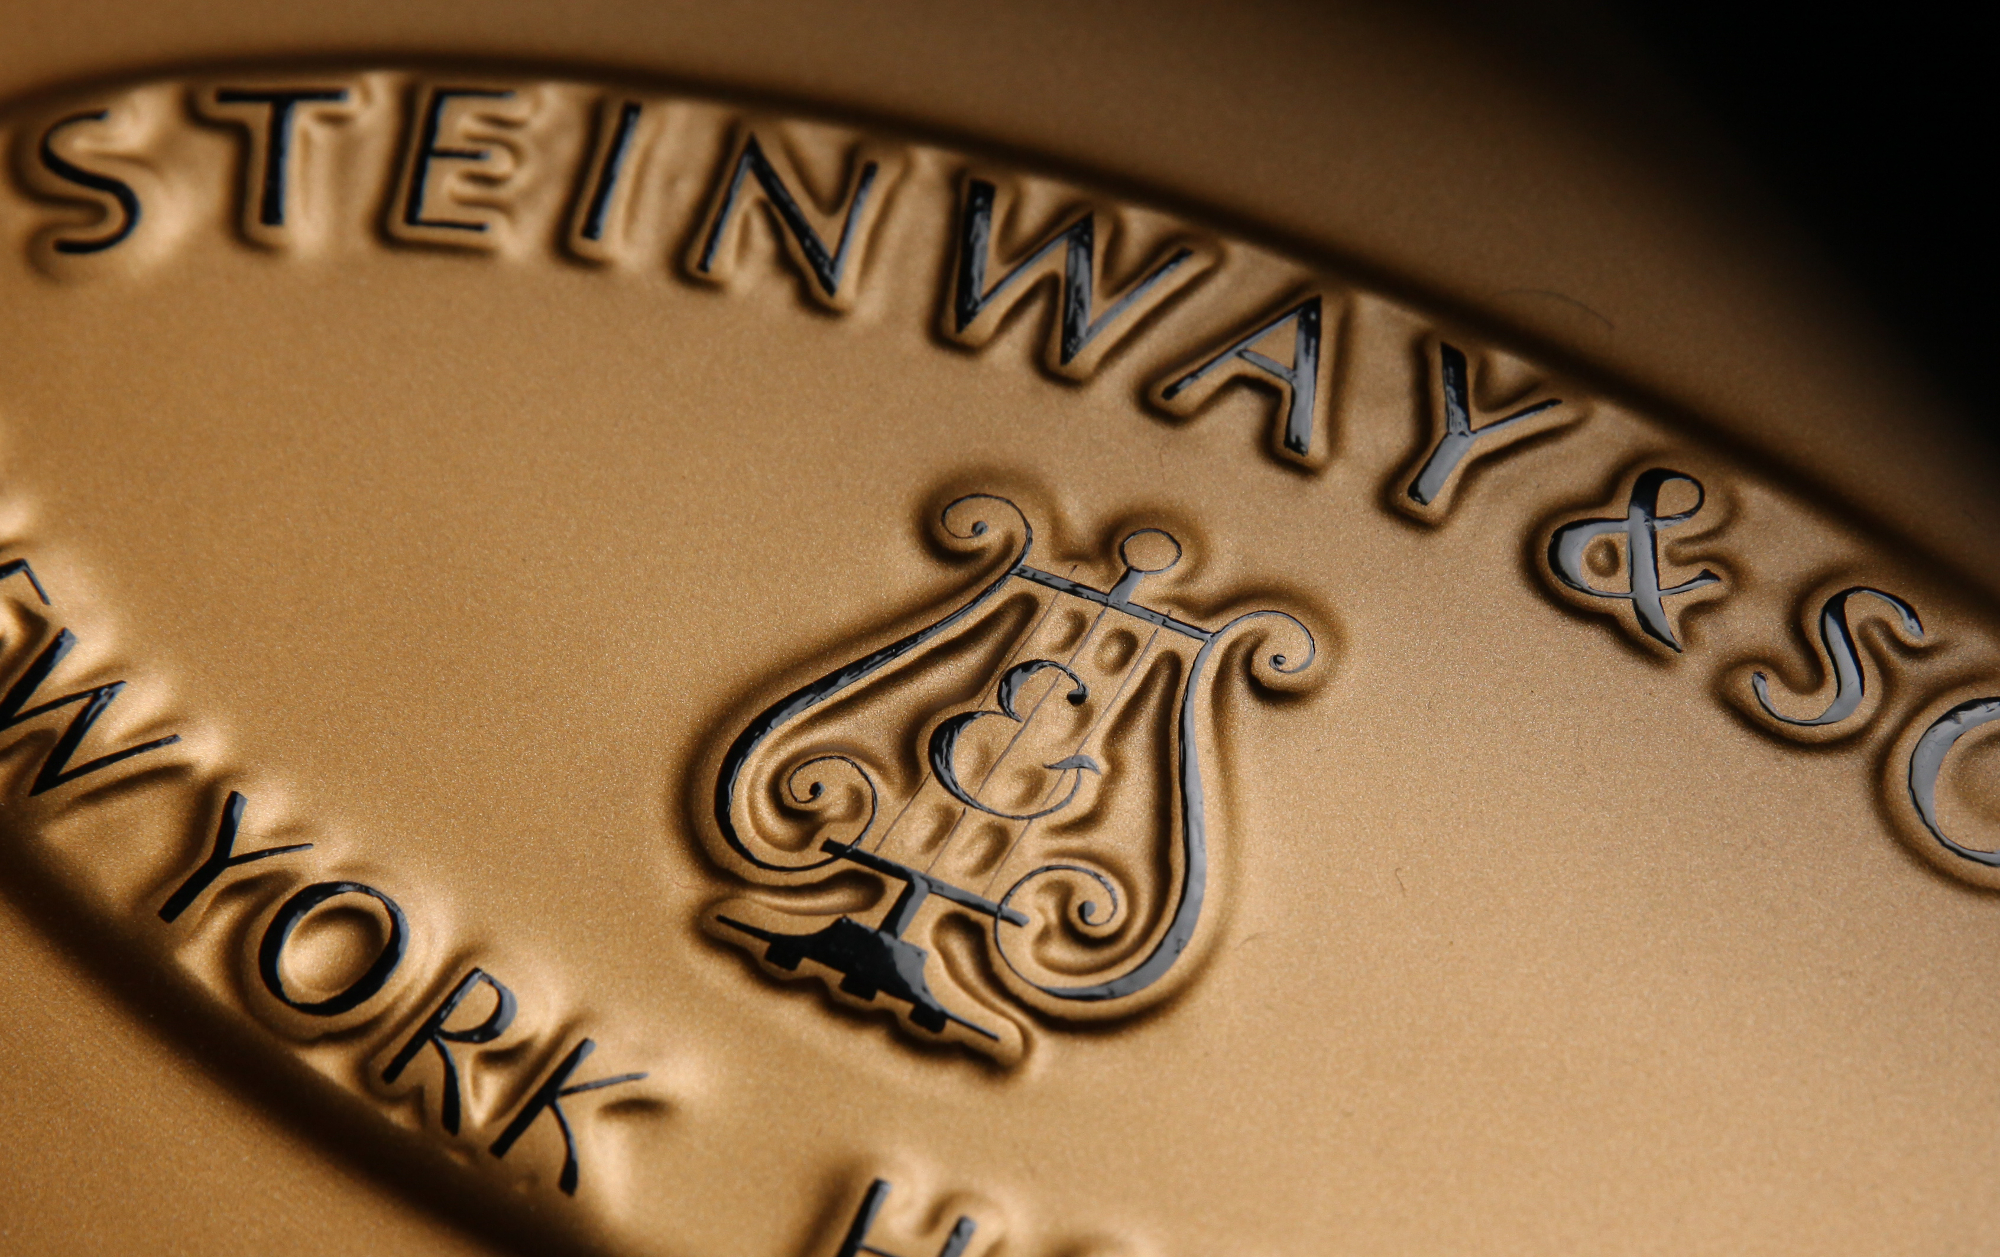 Steinway Gussplatte